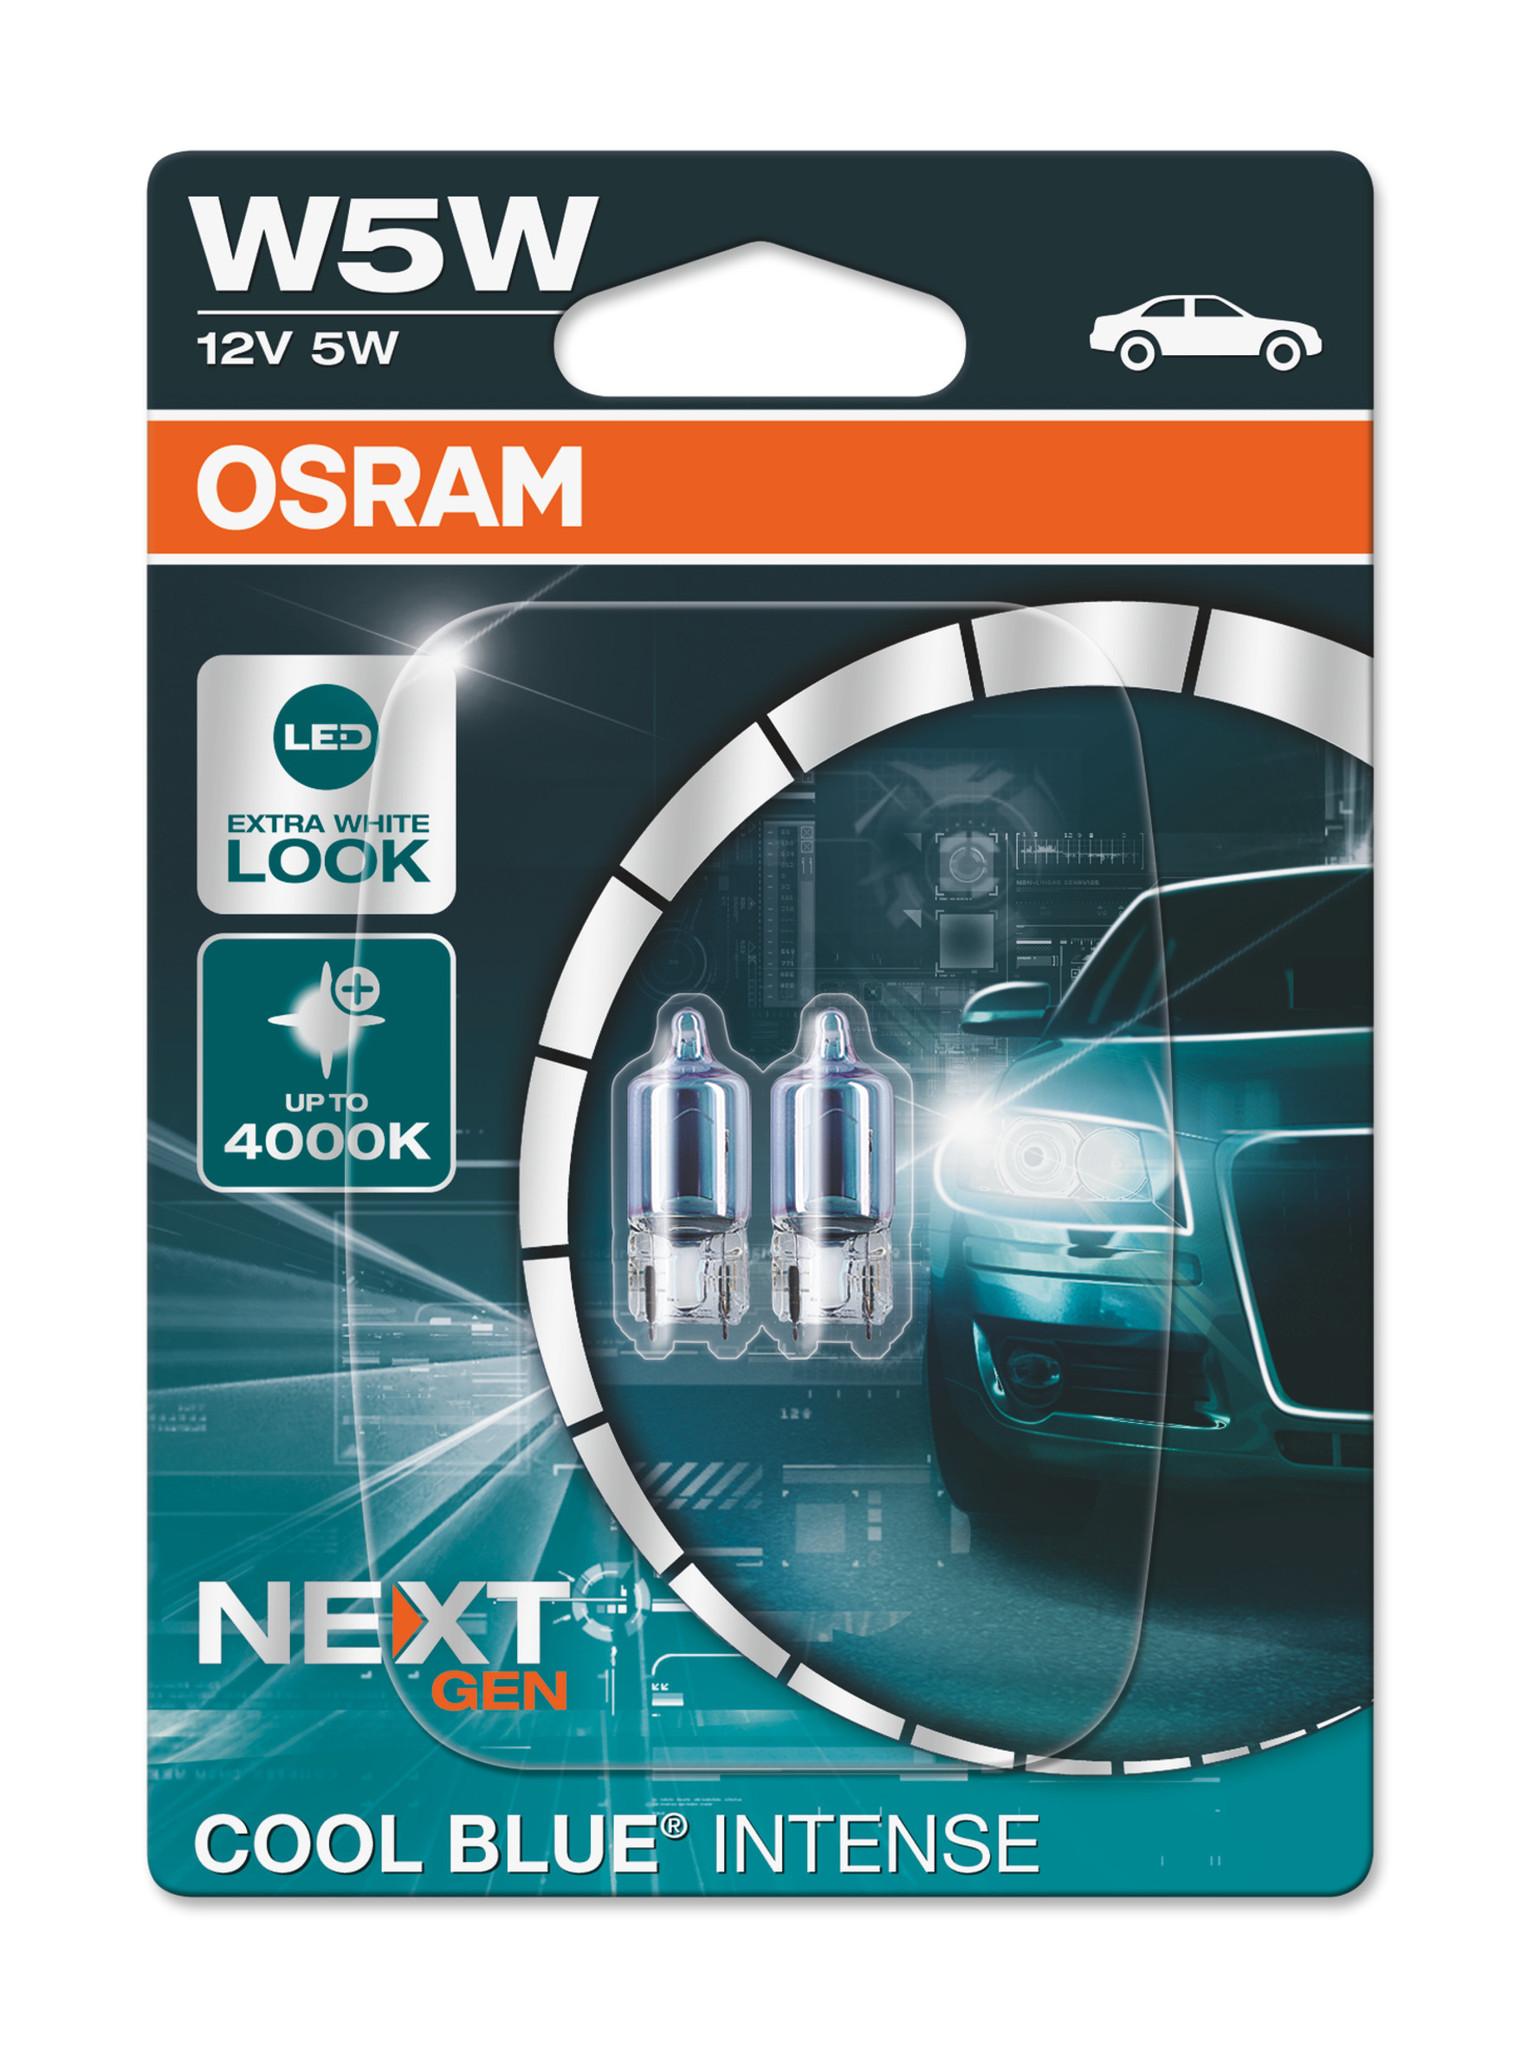 Osram COOL BLUE® INTENSE (NextGen) W5W